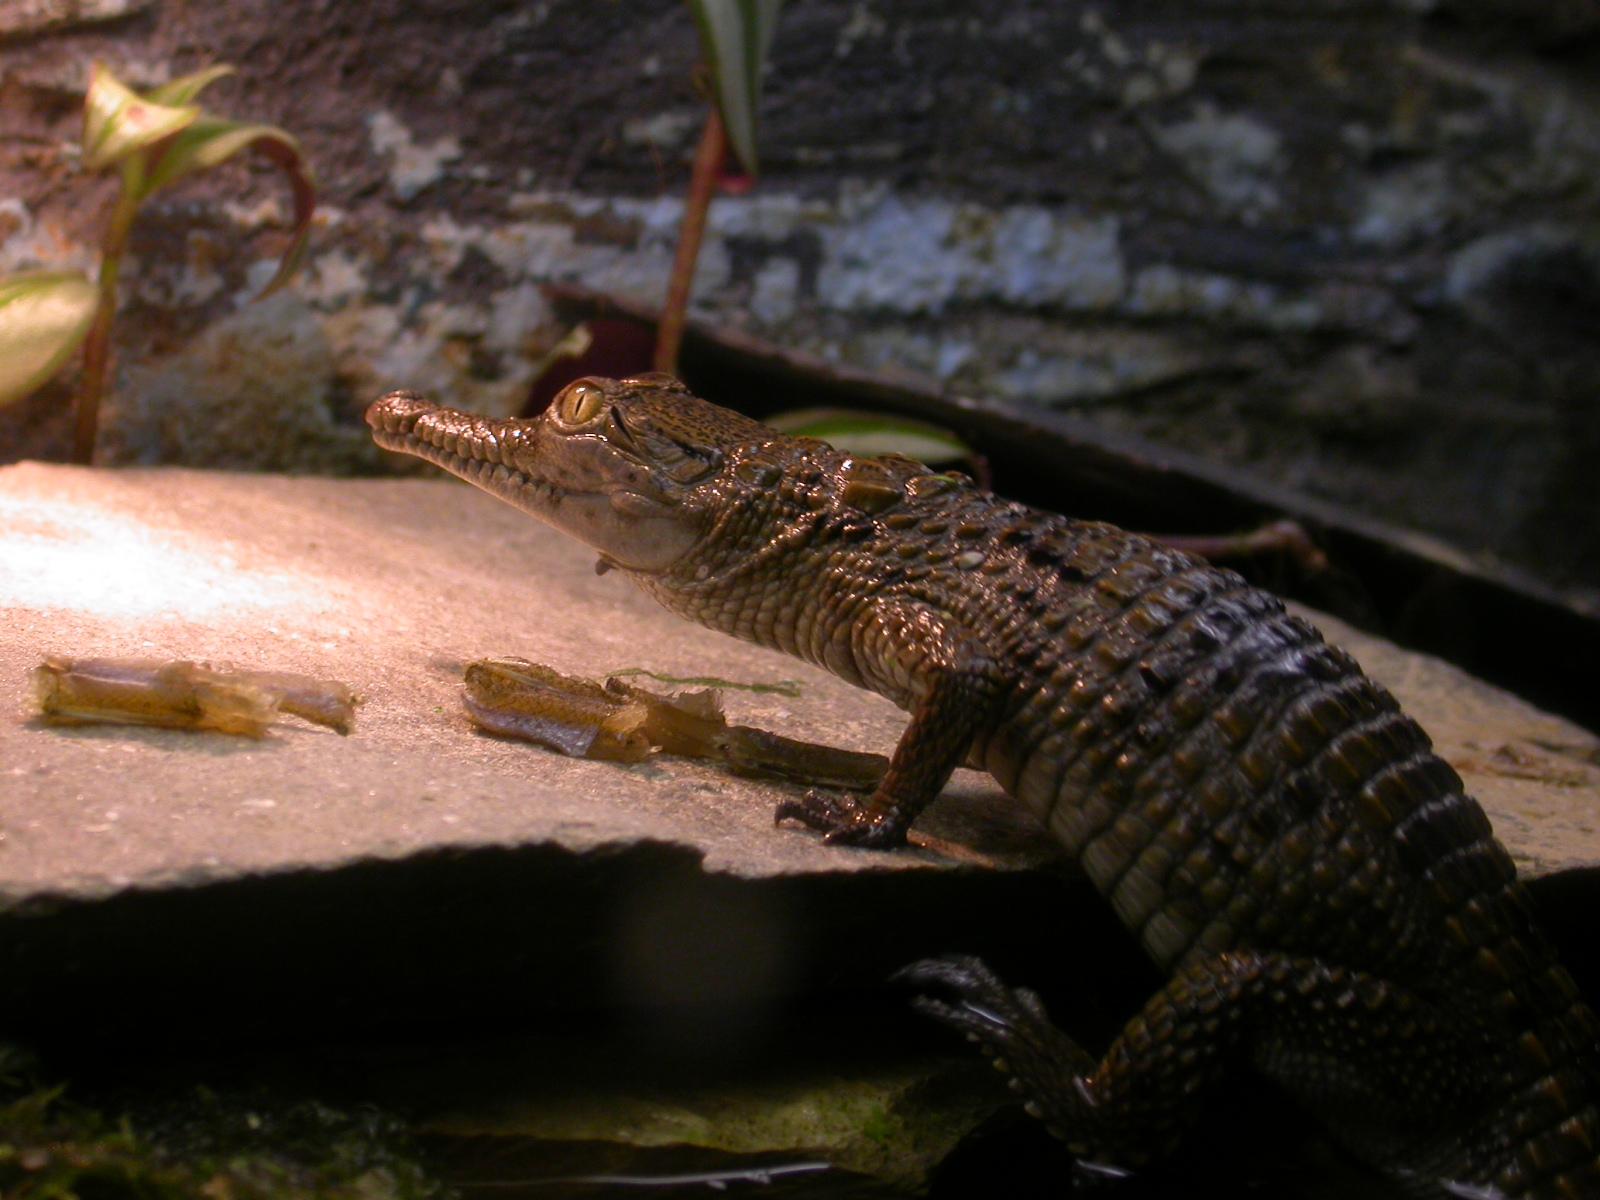 eva aligator shedding skin green lizard reptile crocodile amphibian scales image